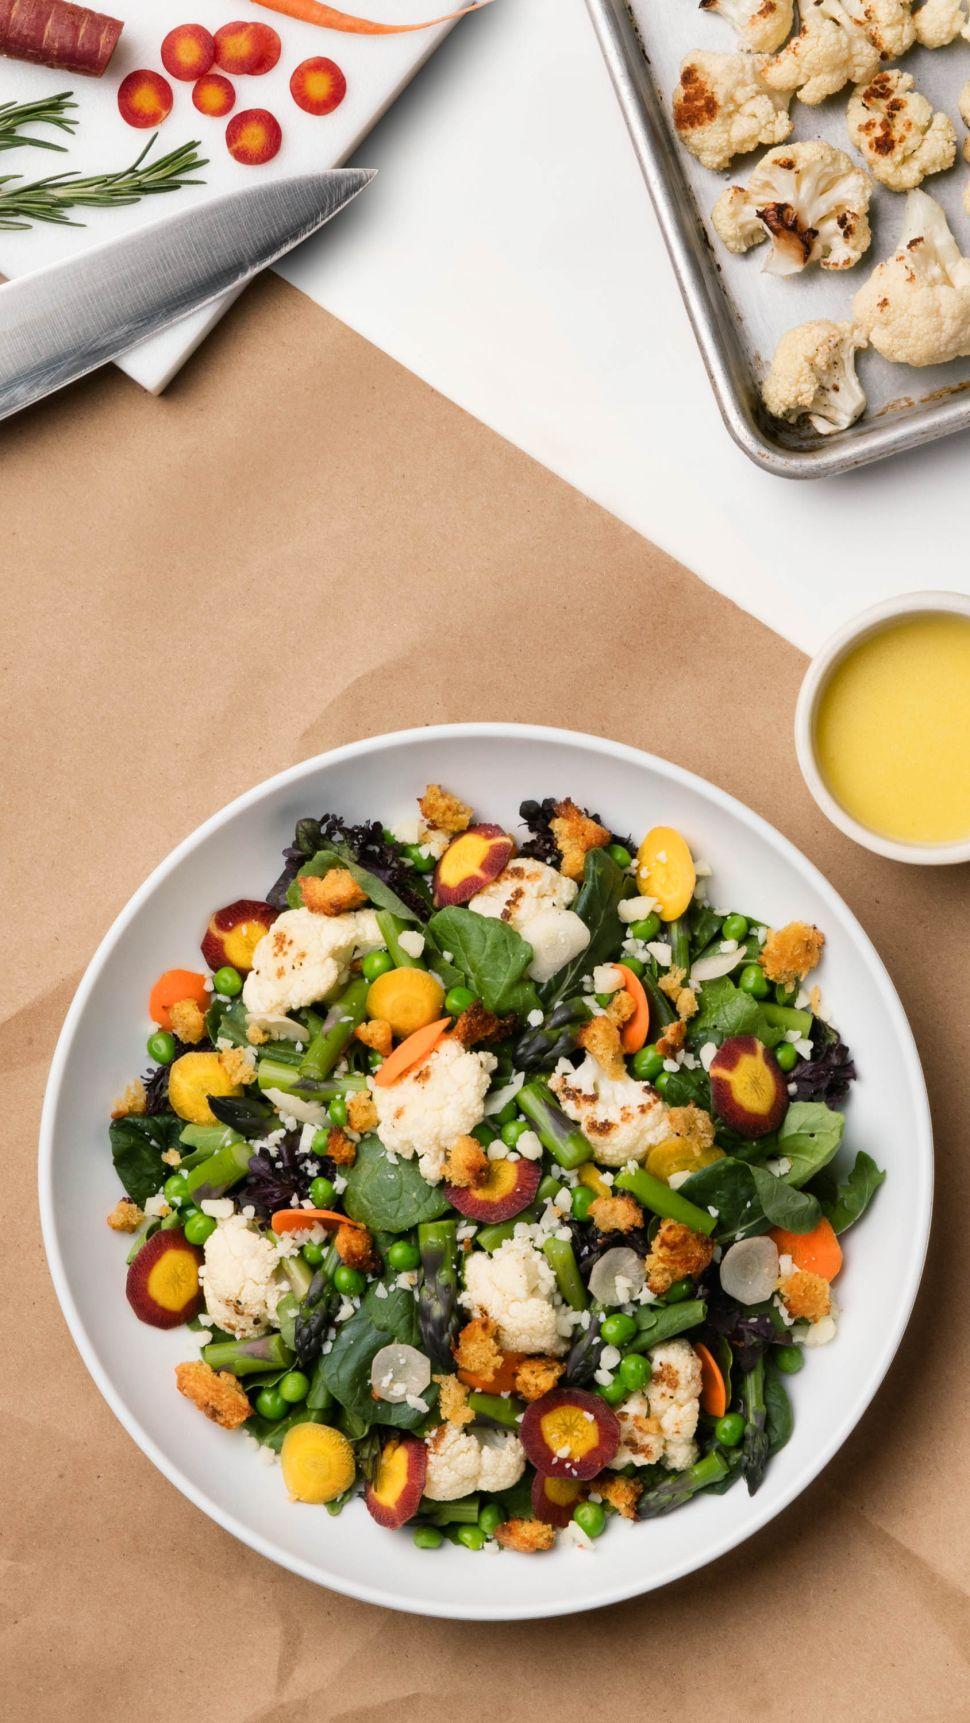 Maple's Latest Chef Collaboration Will Reduce Consumption of Sad Salads